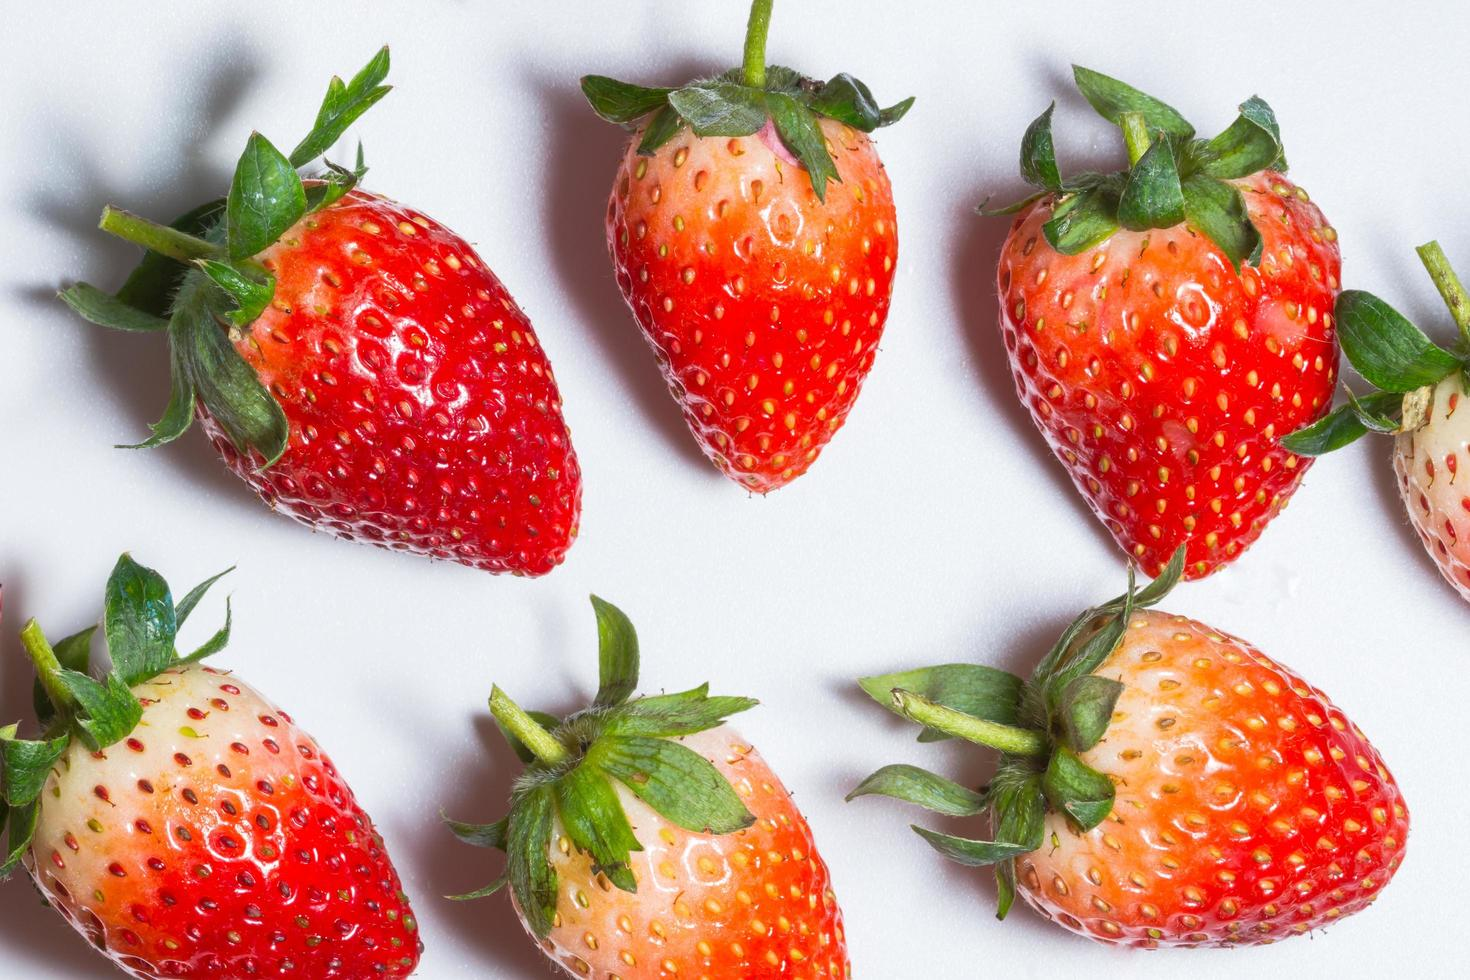 Strawberries on white background photo